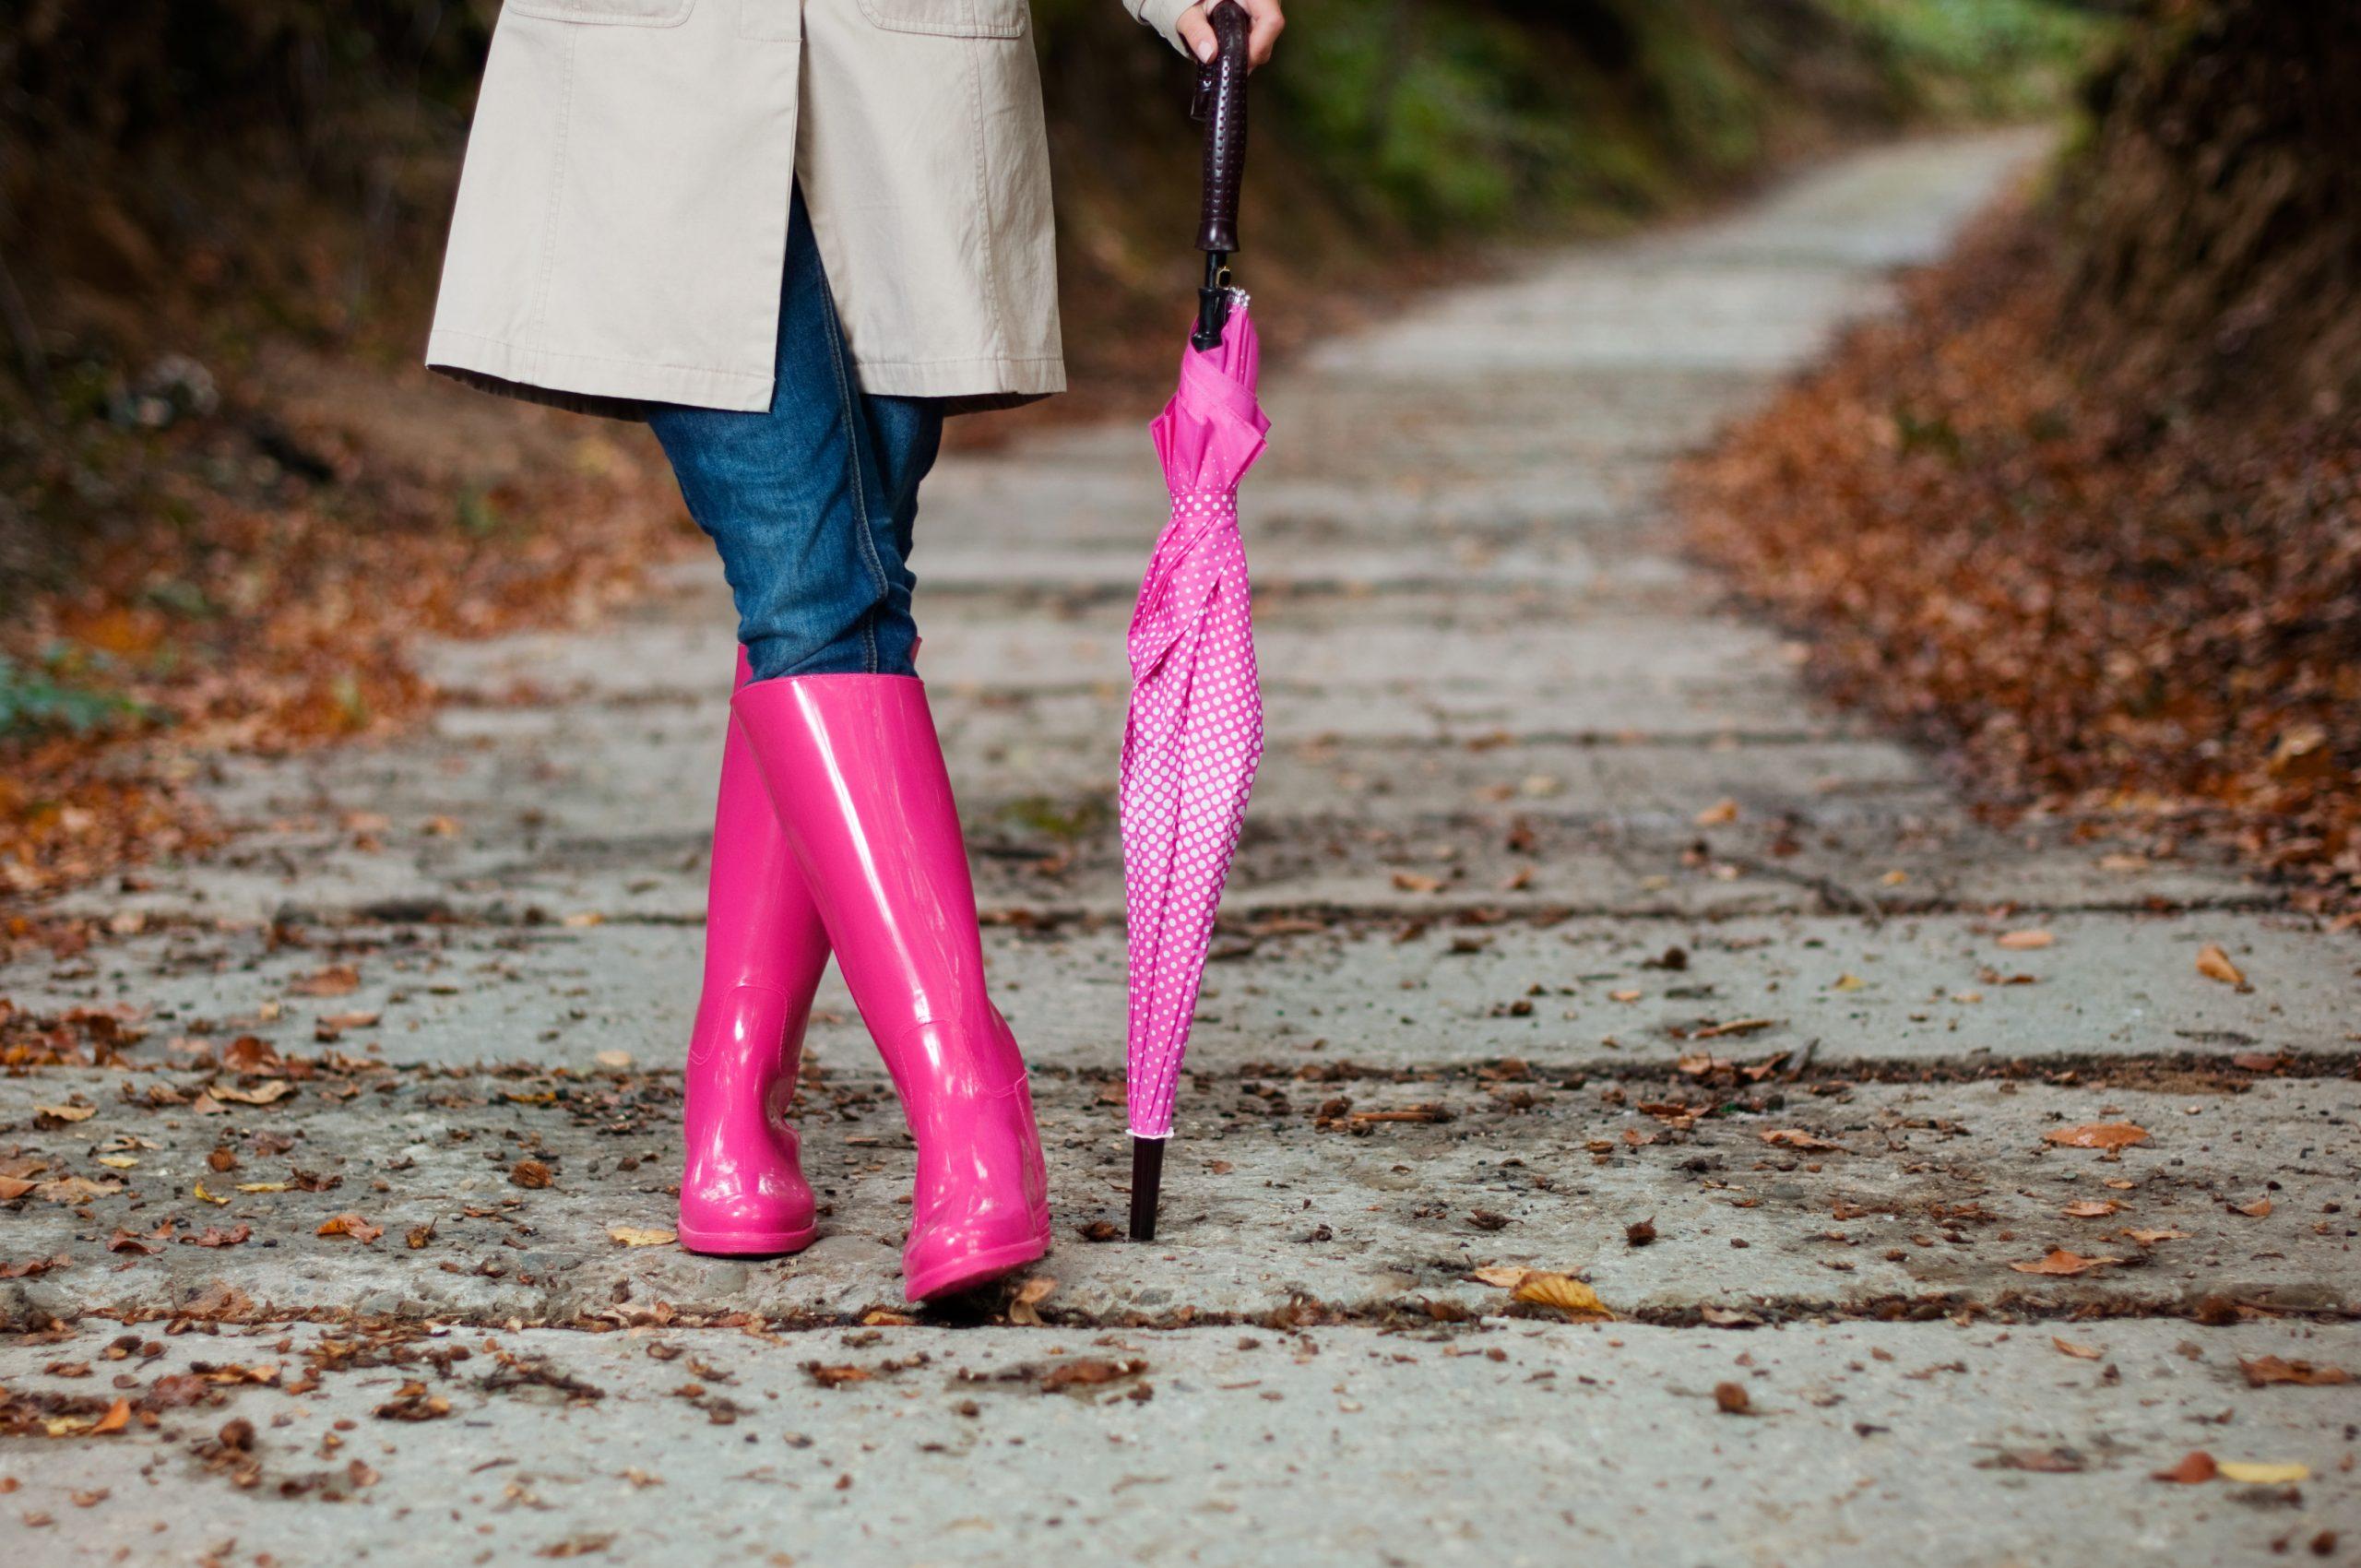 fashionable rain boots